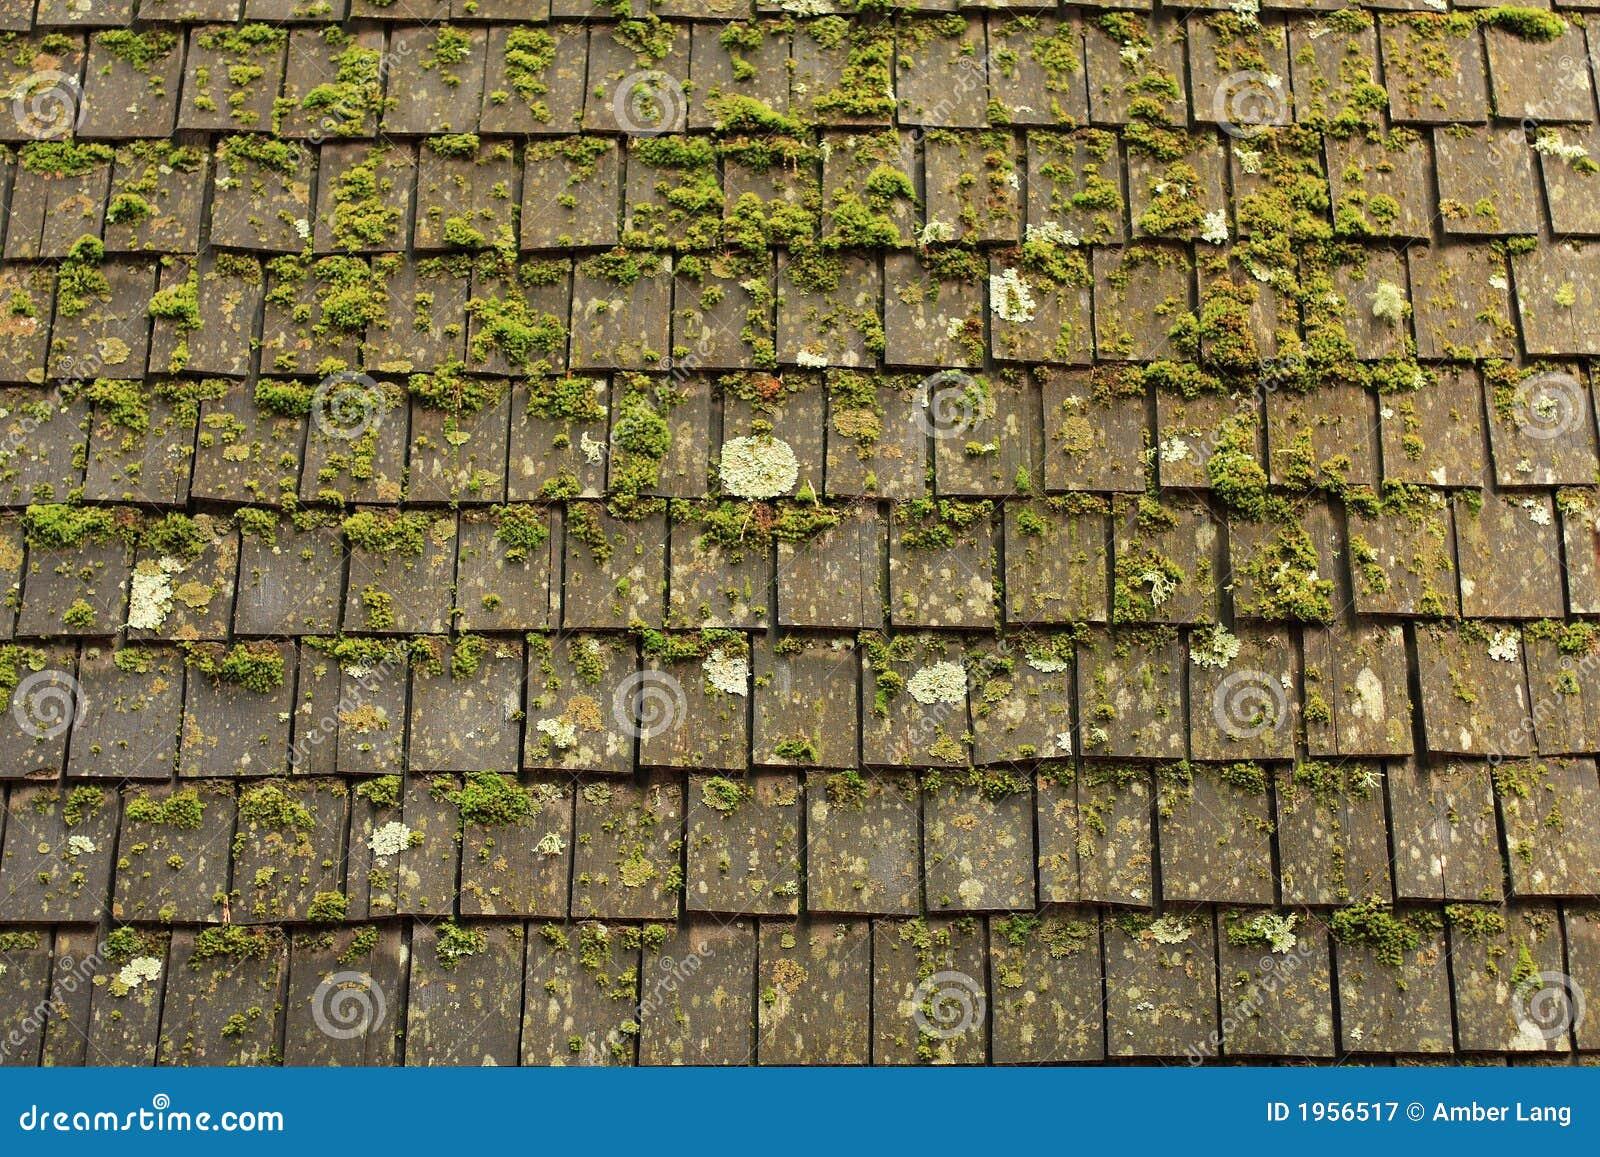 Moss And Shingles Stock Image Image Of Rain Green